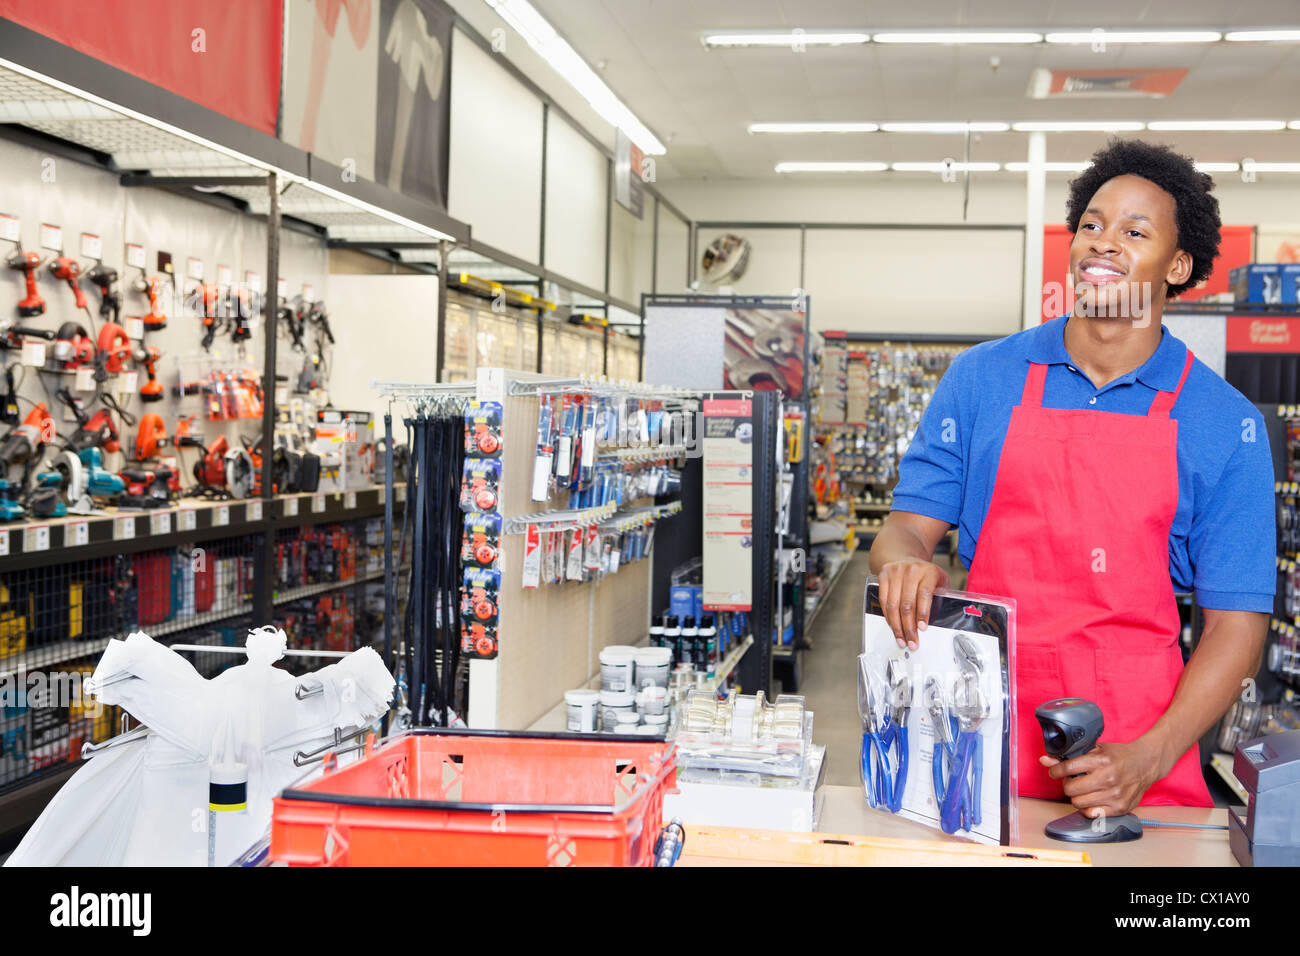 African Sales Clerk Hardware Store Banque d'image et photos - Alamy